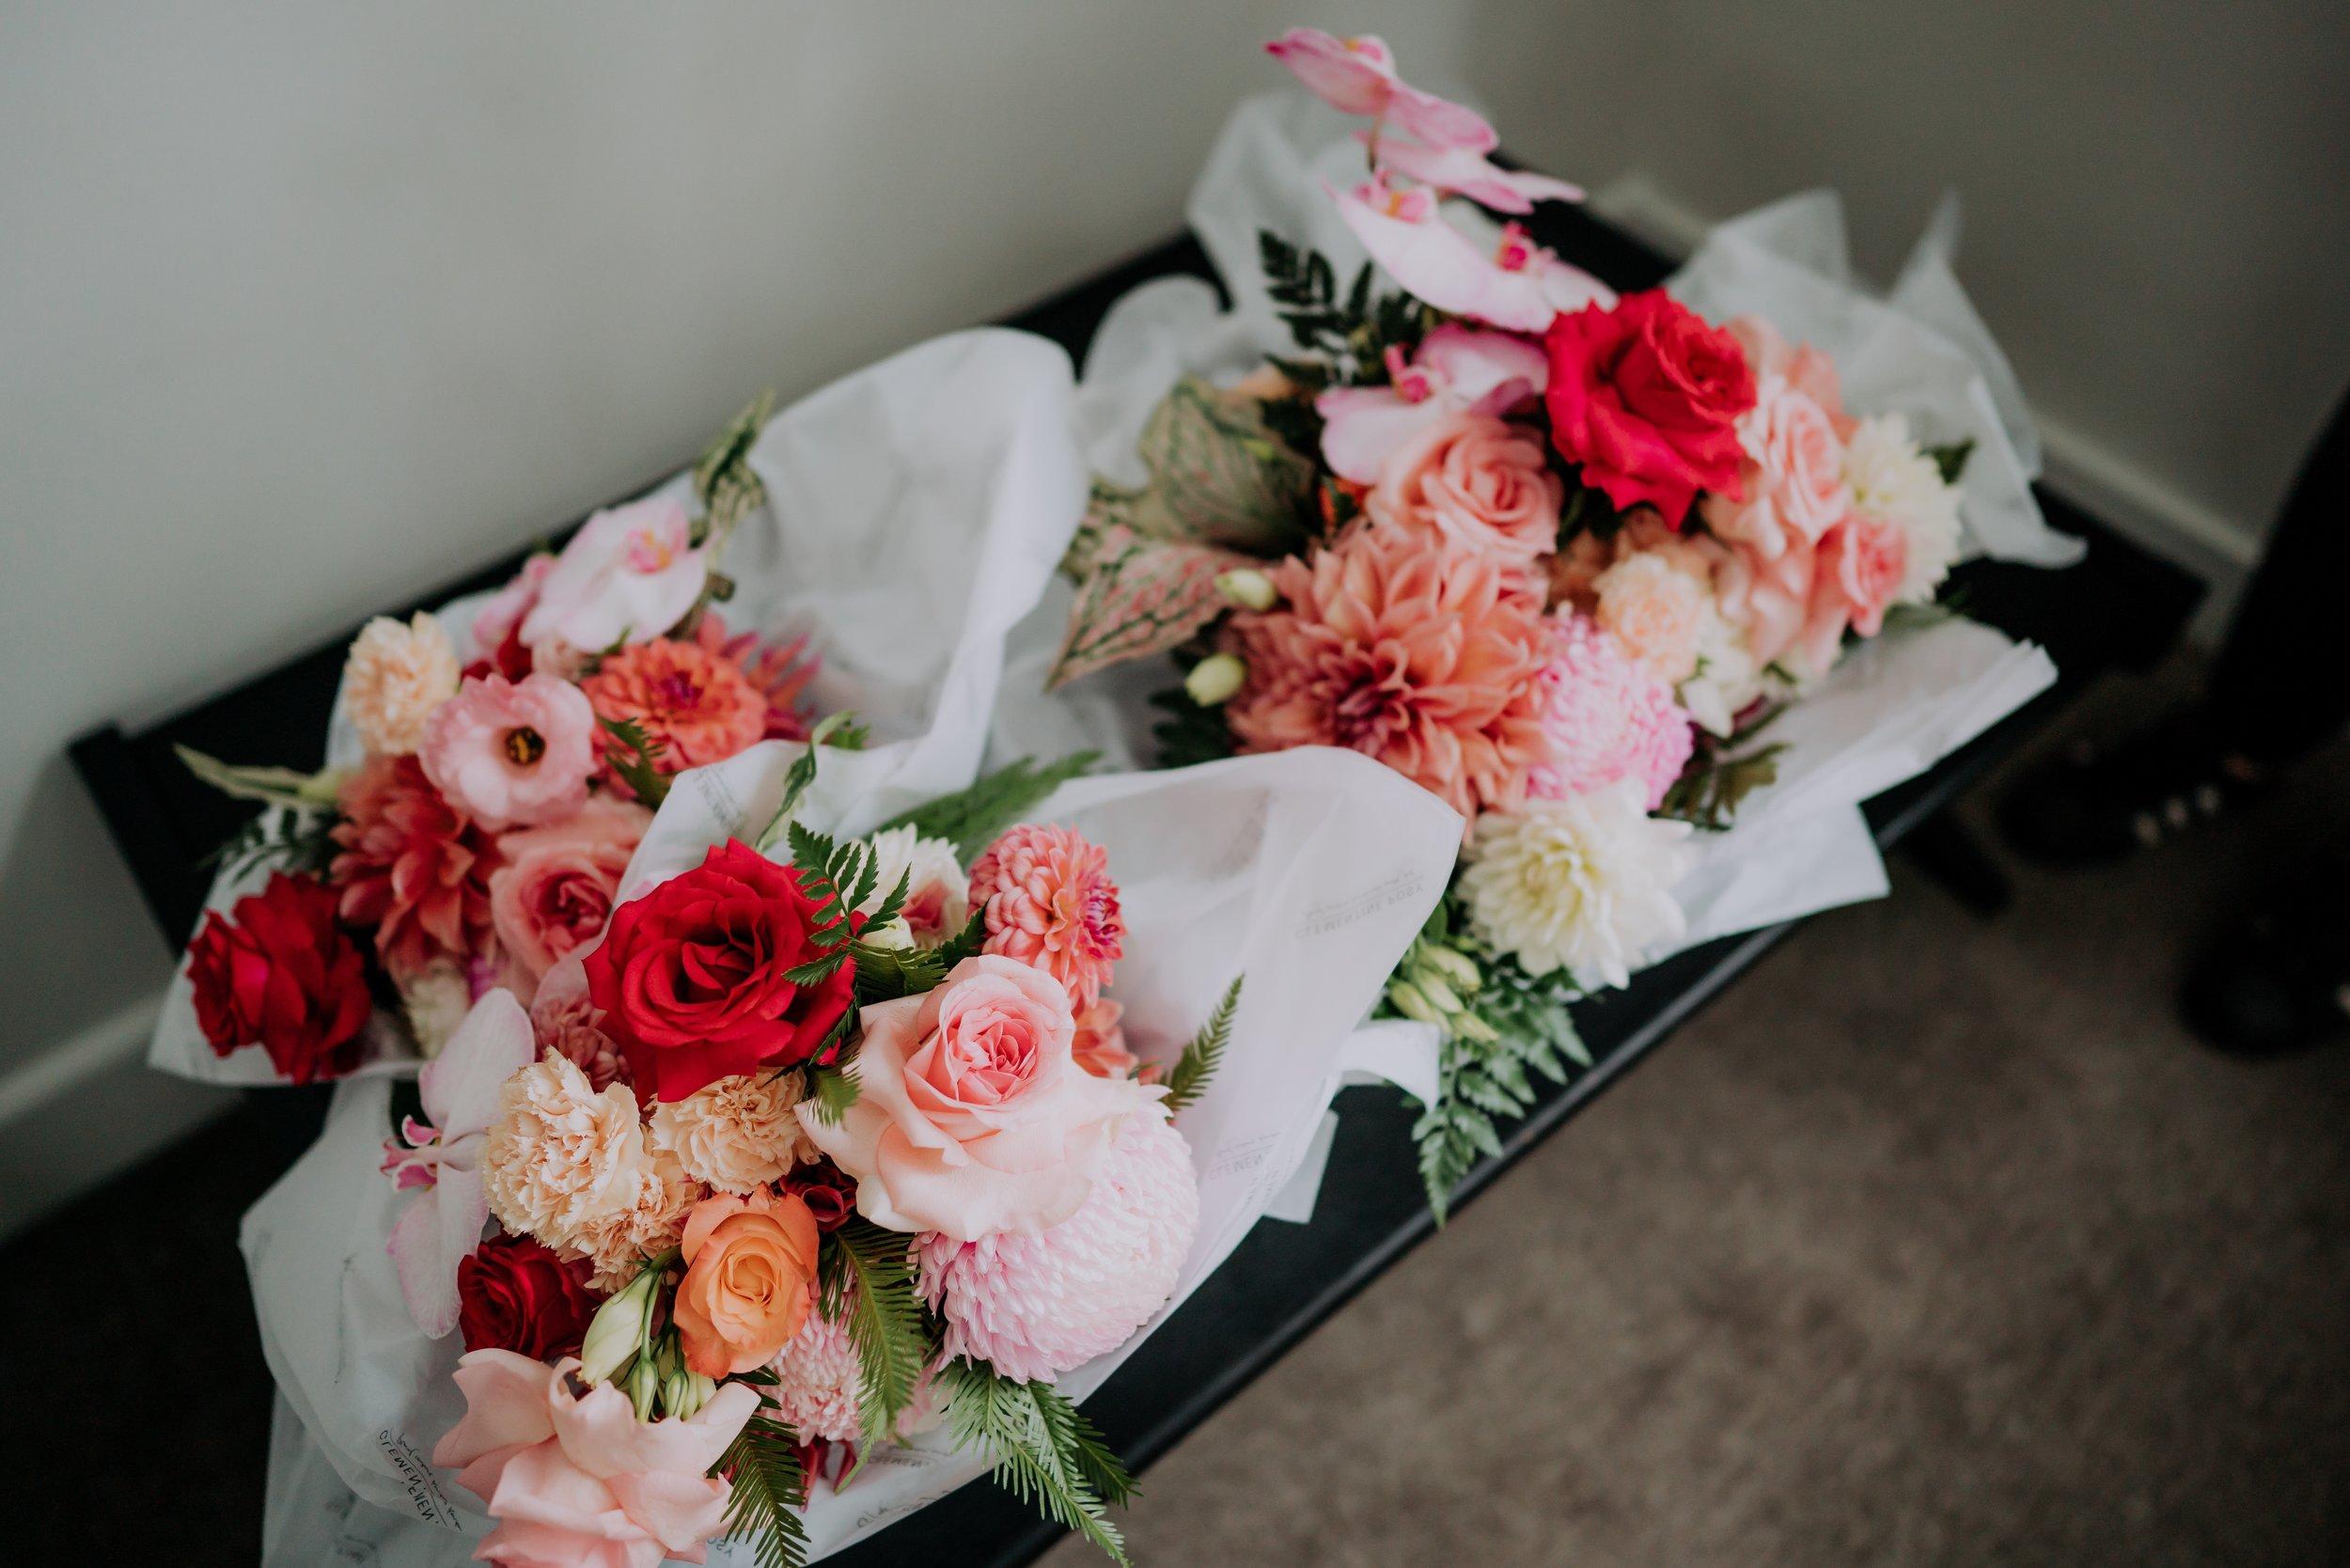 ava-me-photography-gemma-brent-zest-point-piper-sydney-wedding-176.jpg